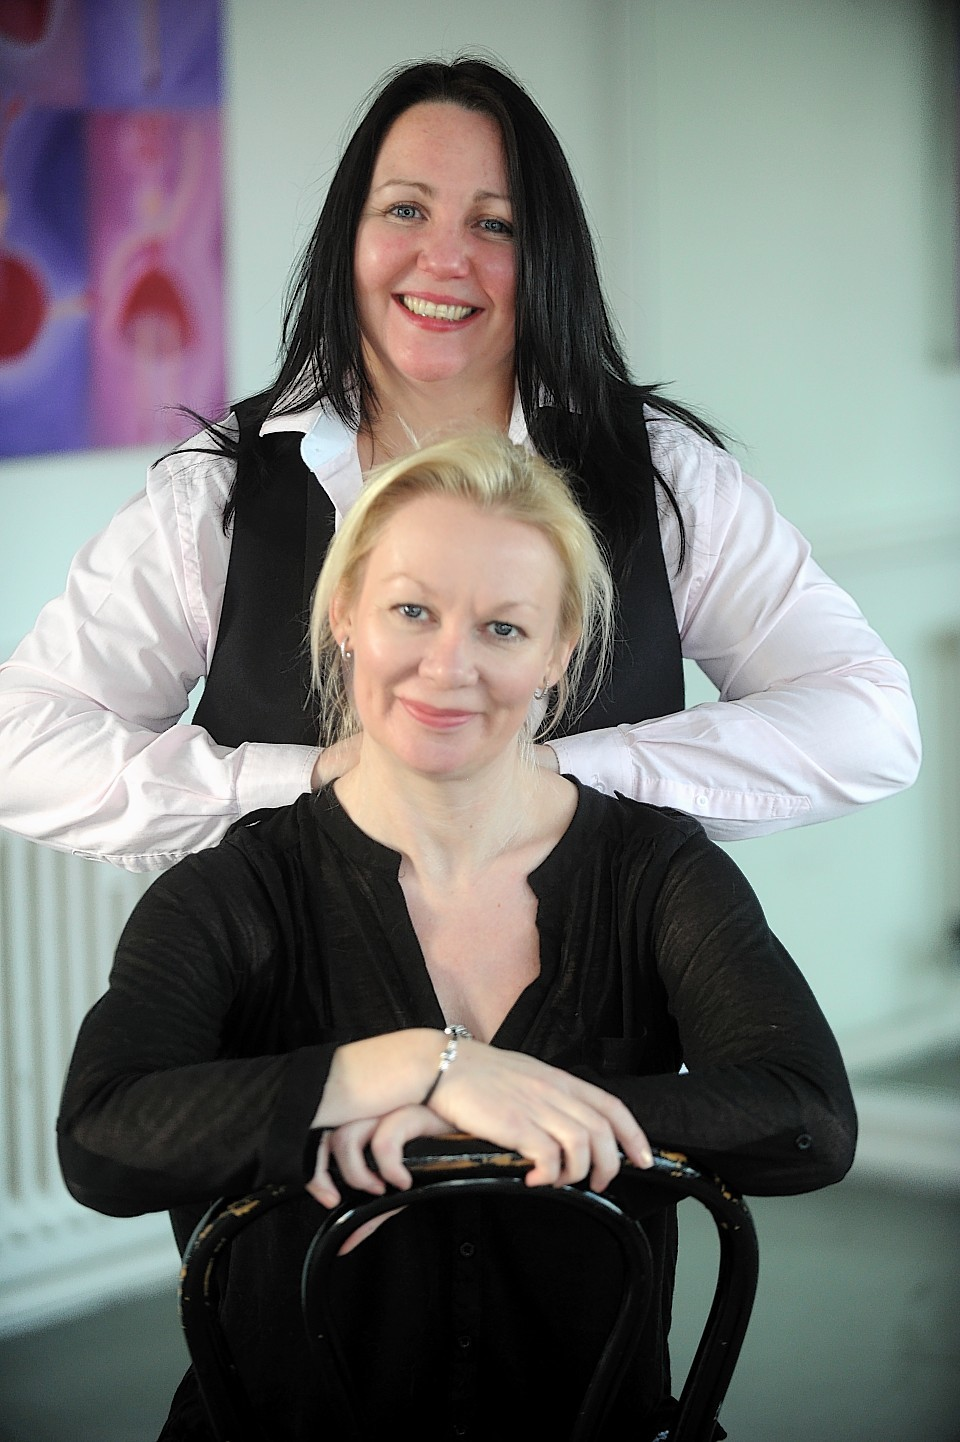 Tish Tindall and Diane Aspinall